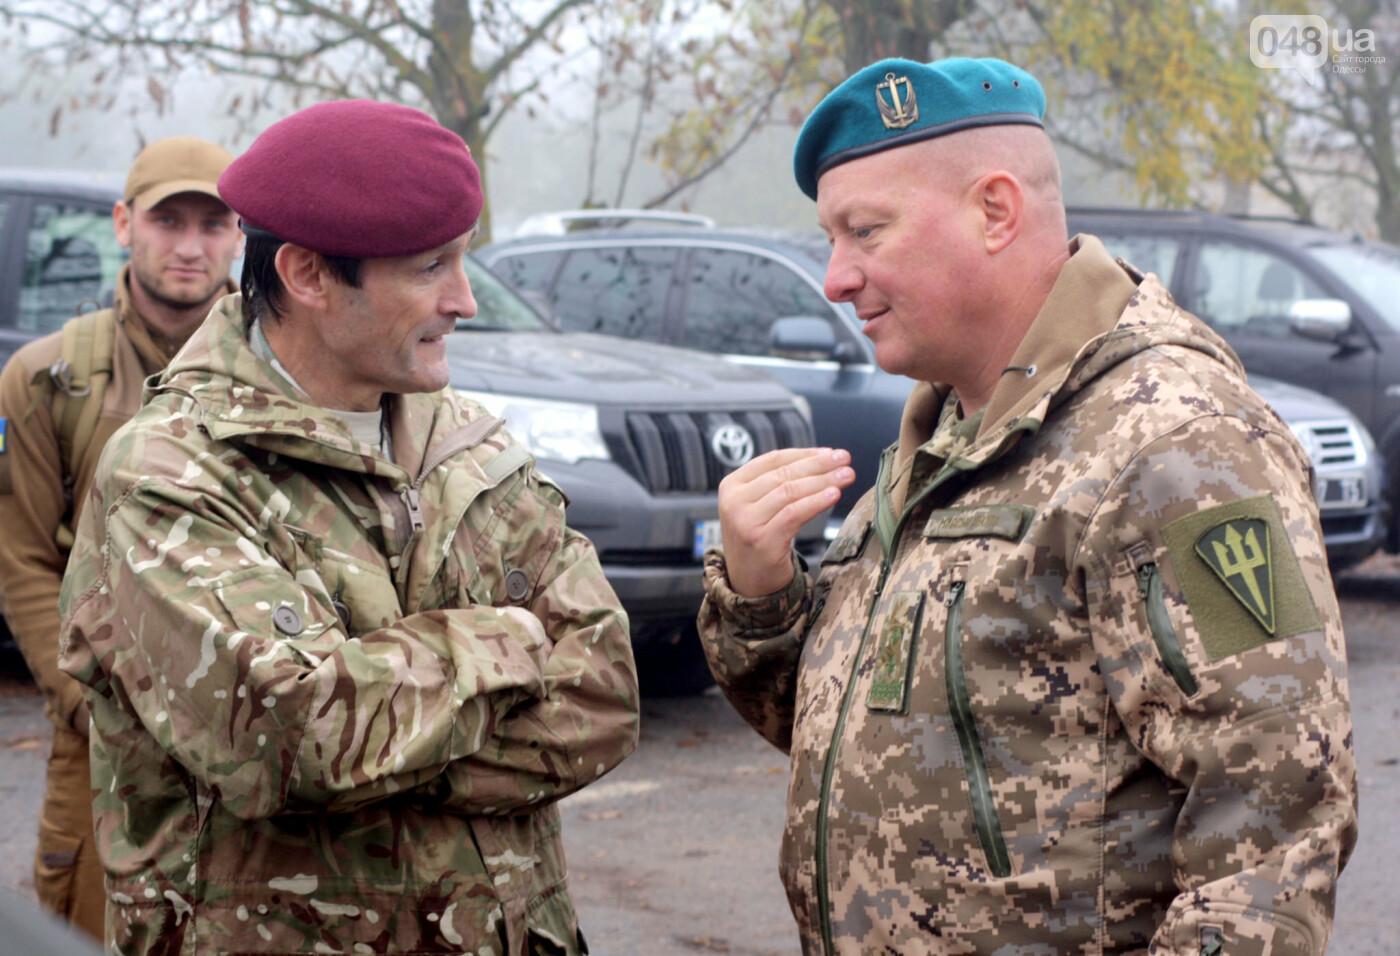 Генерал-лейтенант Юрий Содоль (справа) - АрміяInform